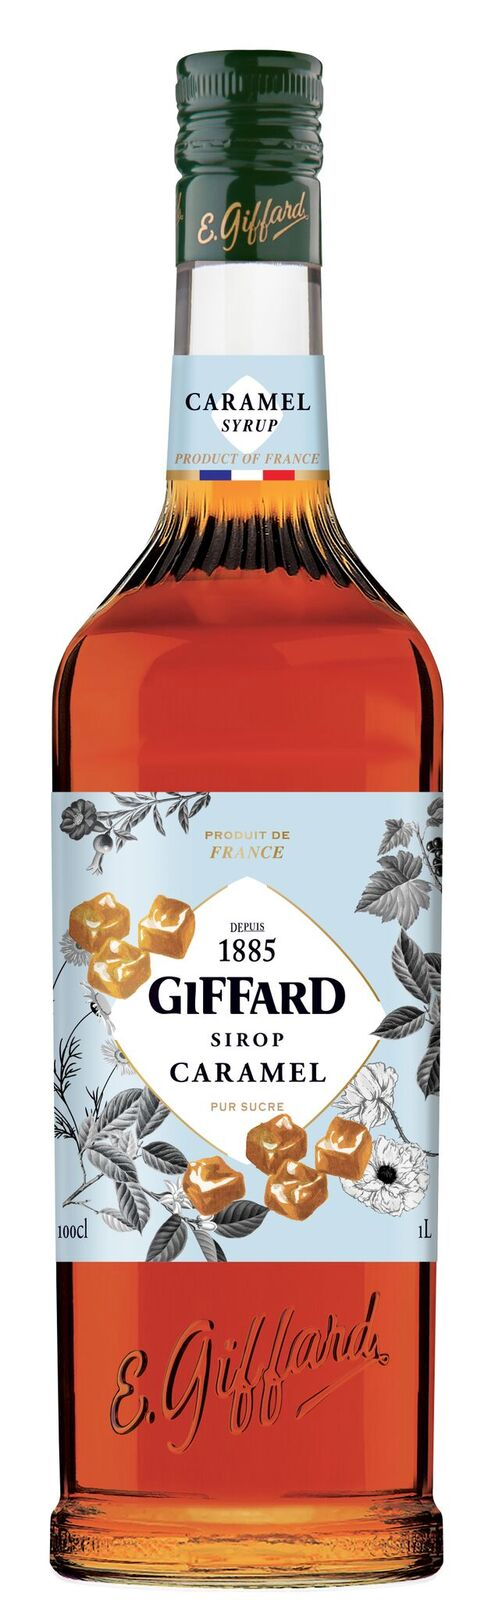 Giffard (sirupy, likéry) Giffard Caramel - Karamelový sirup 1l